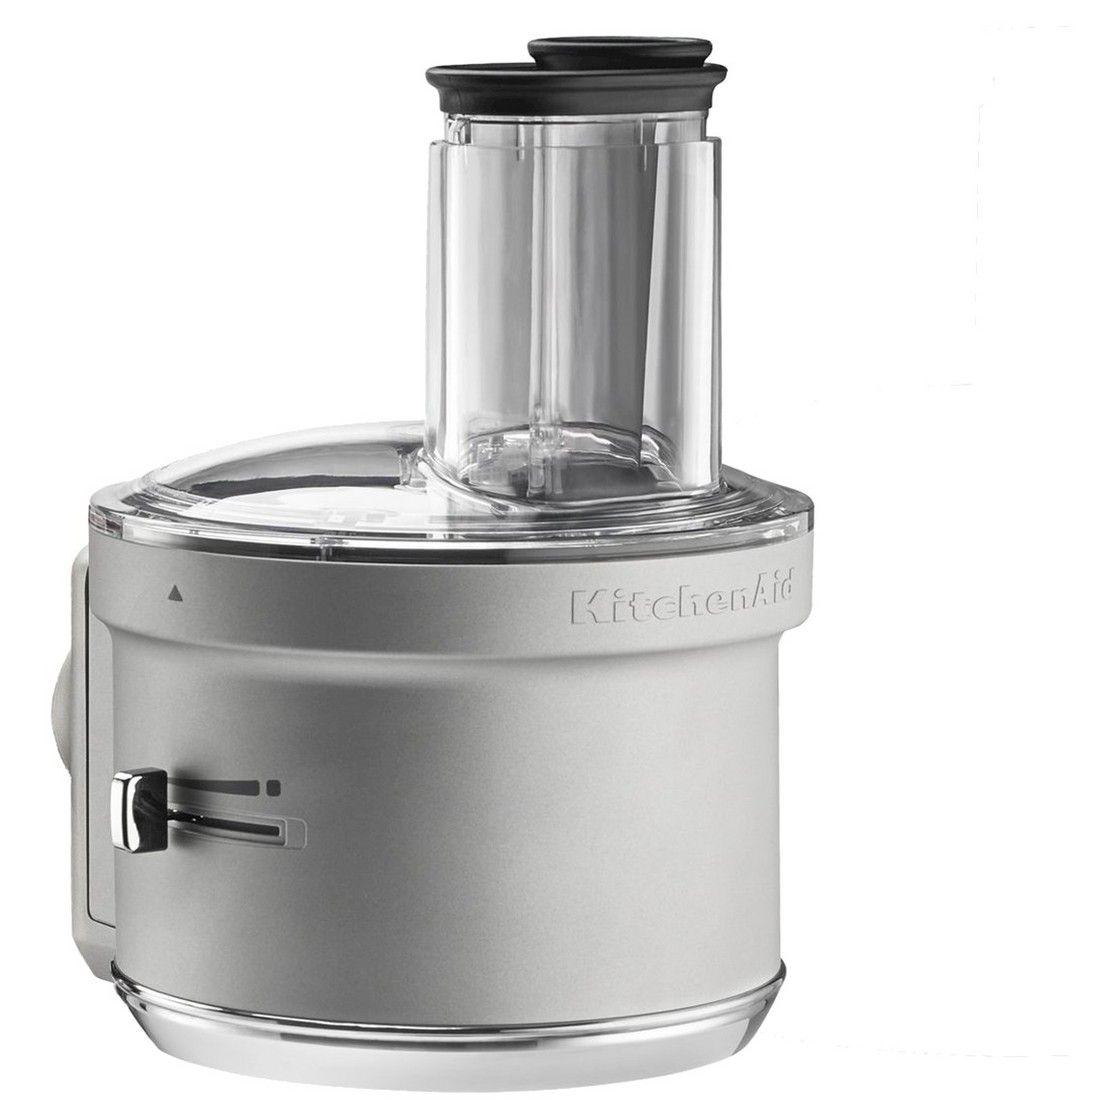 Kitchenaid food processor mixer attachment ksm2fpa food